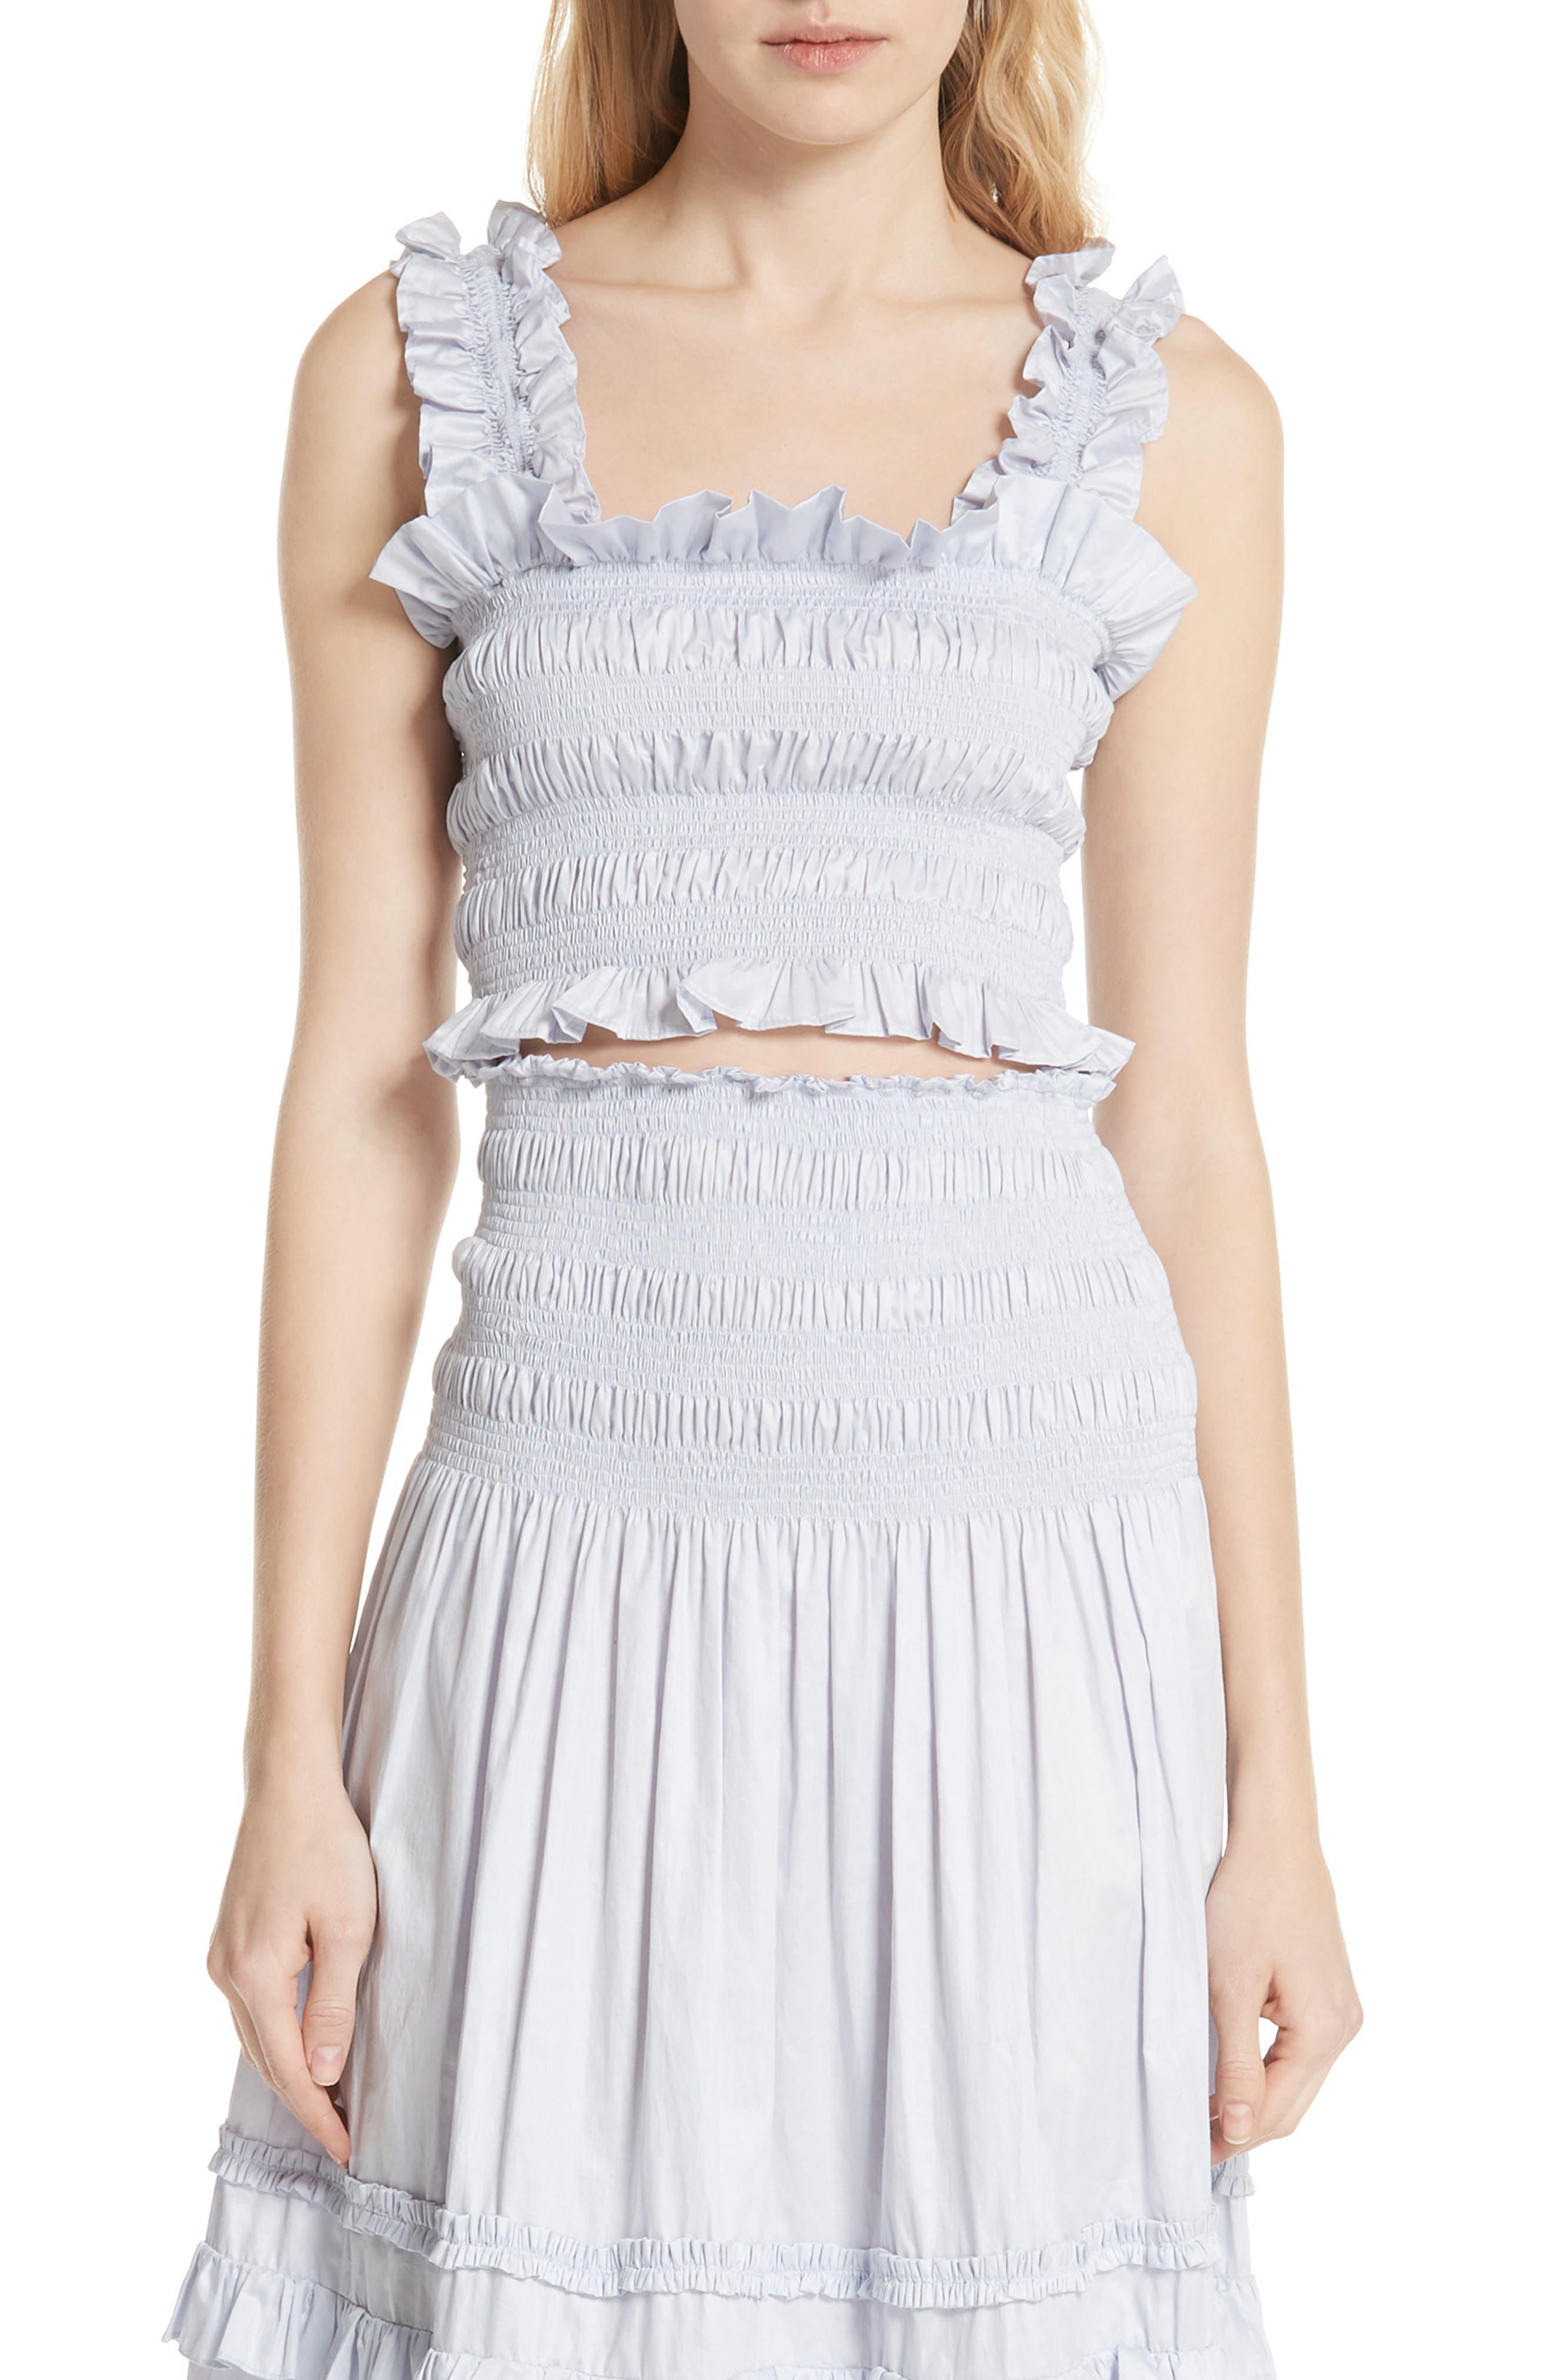 REBECCA TAYLOR Smocked Sleeveless Cotton Top, Main, color, 458